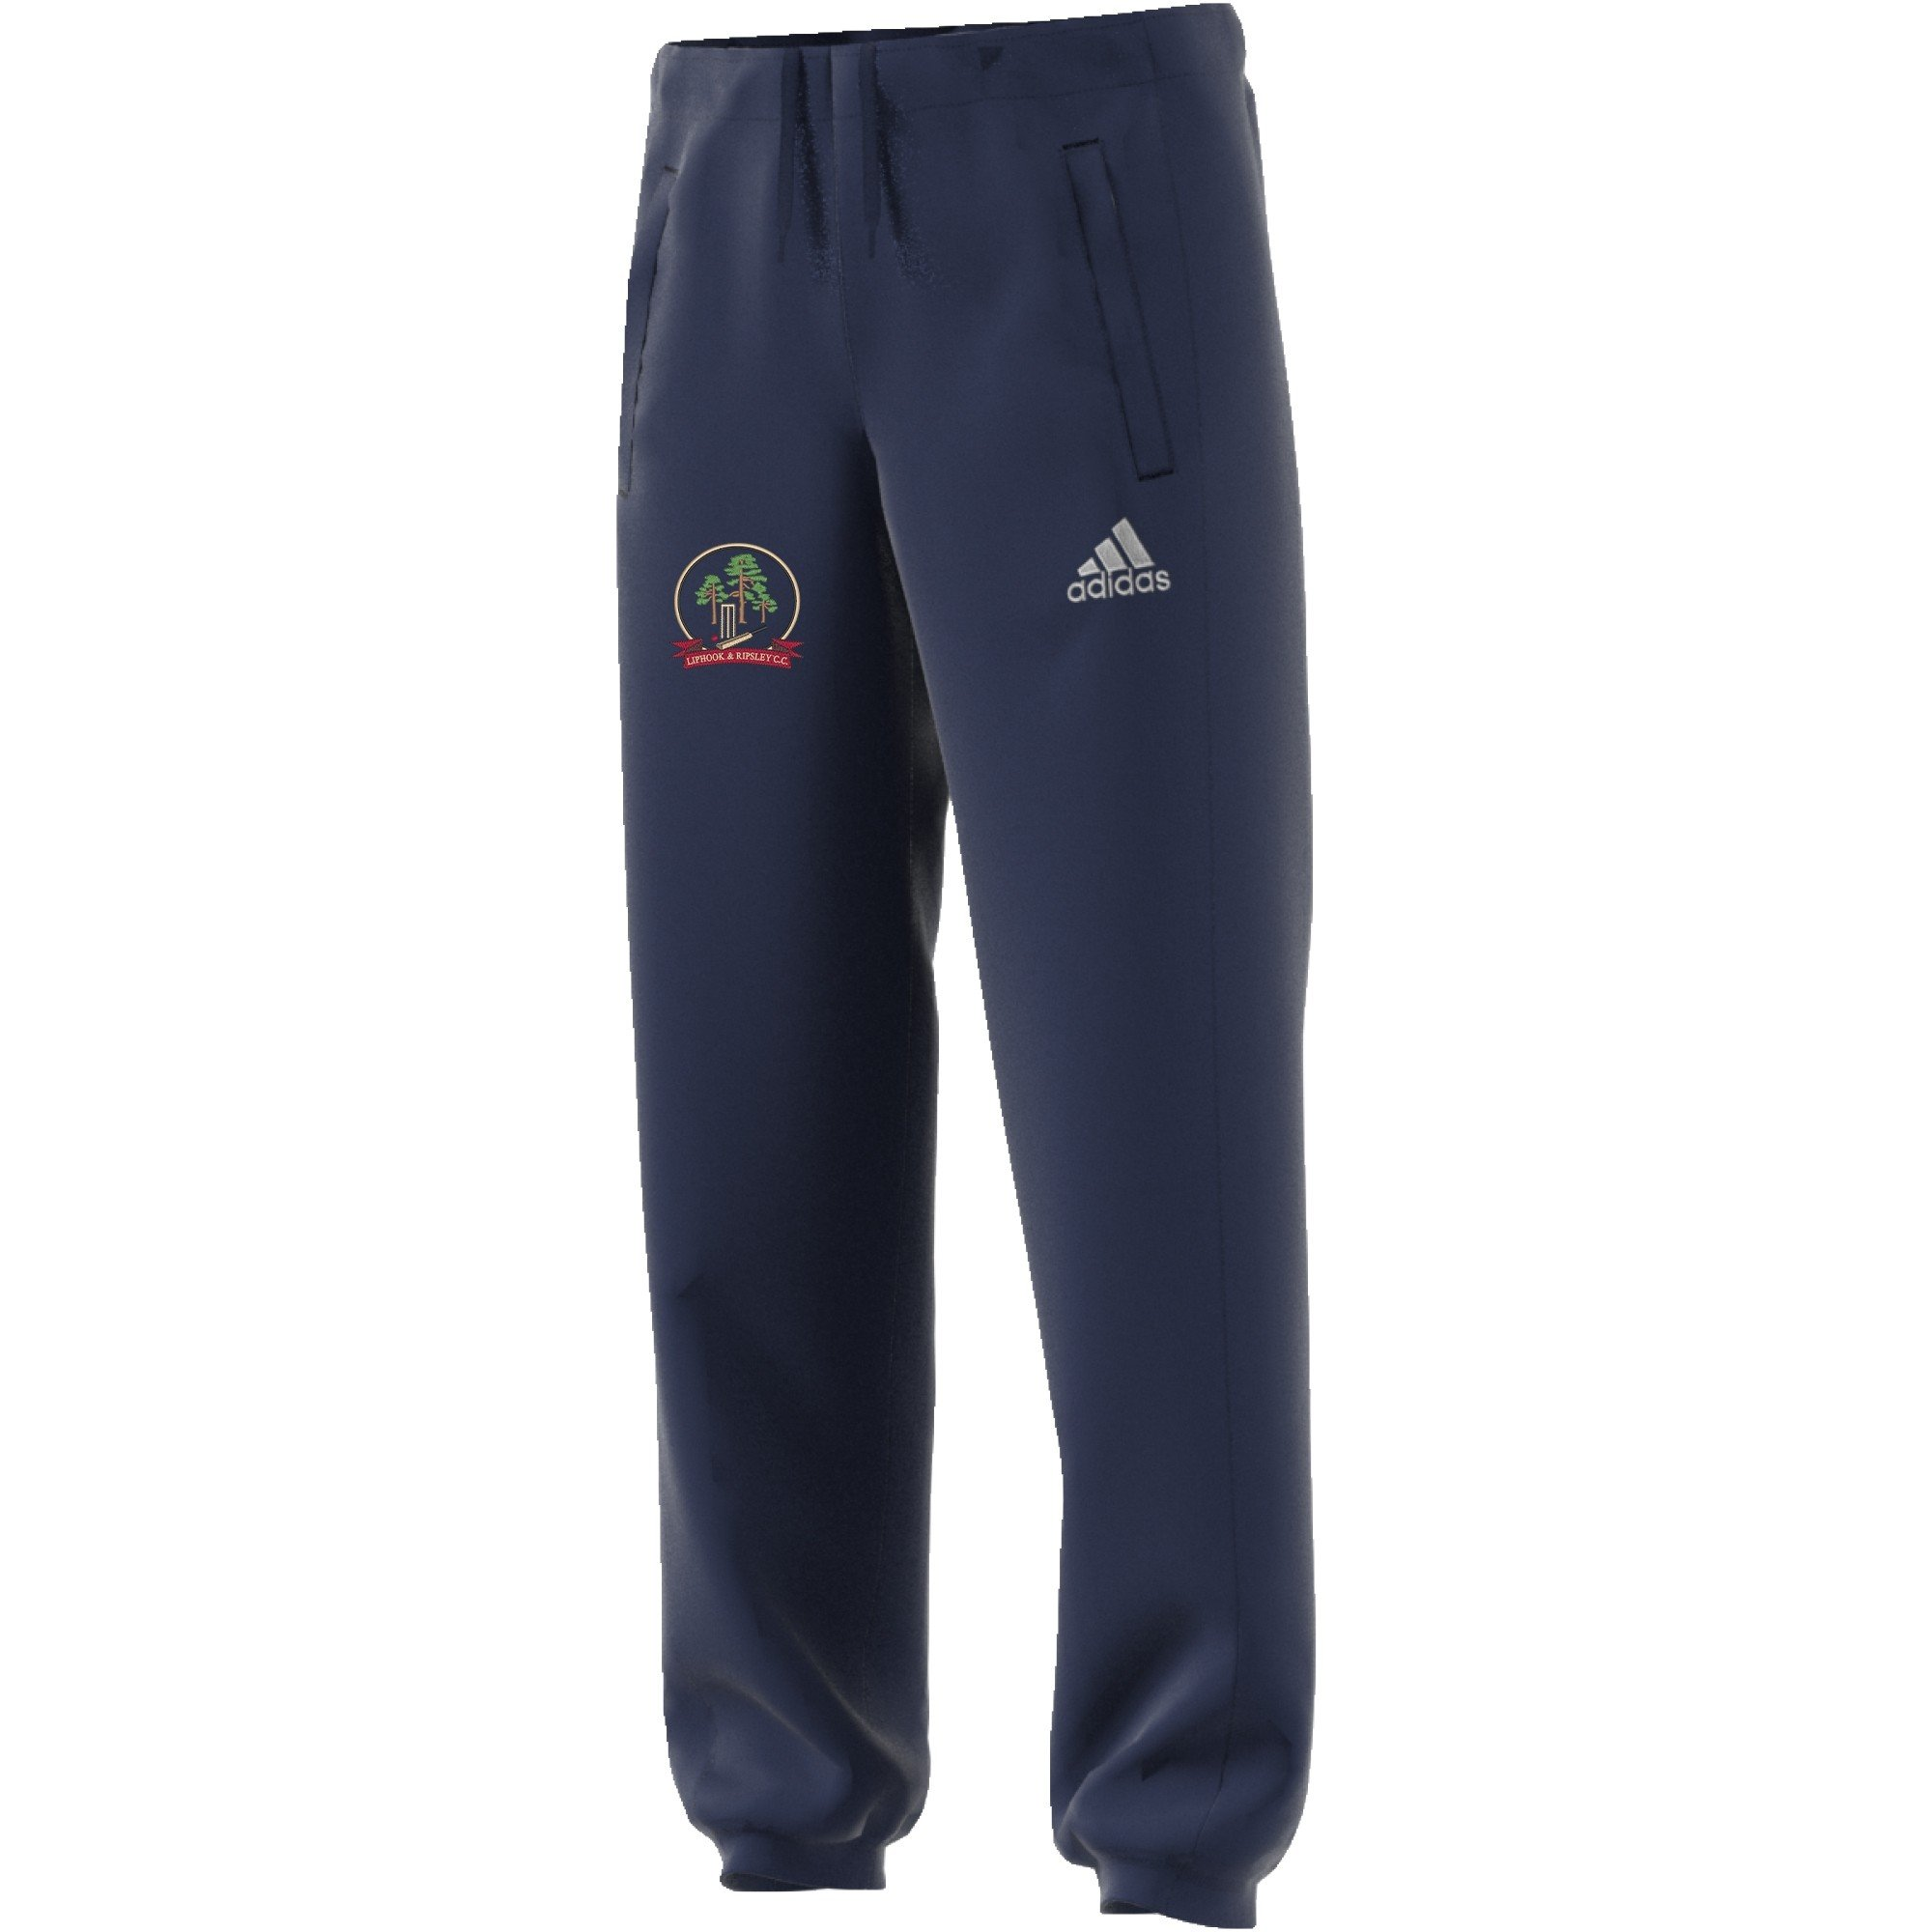 Liphook and Ripsley CC Adidas Navy Sweat Pants